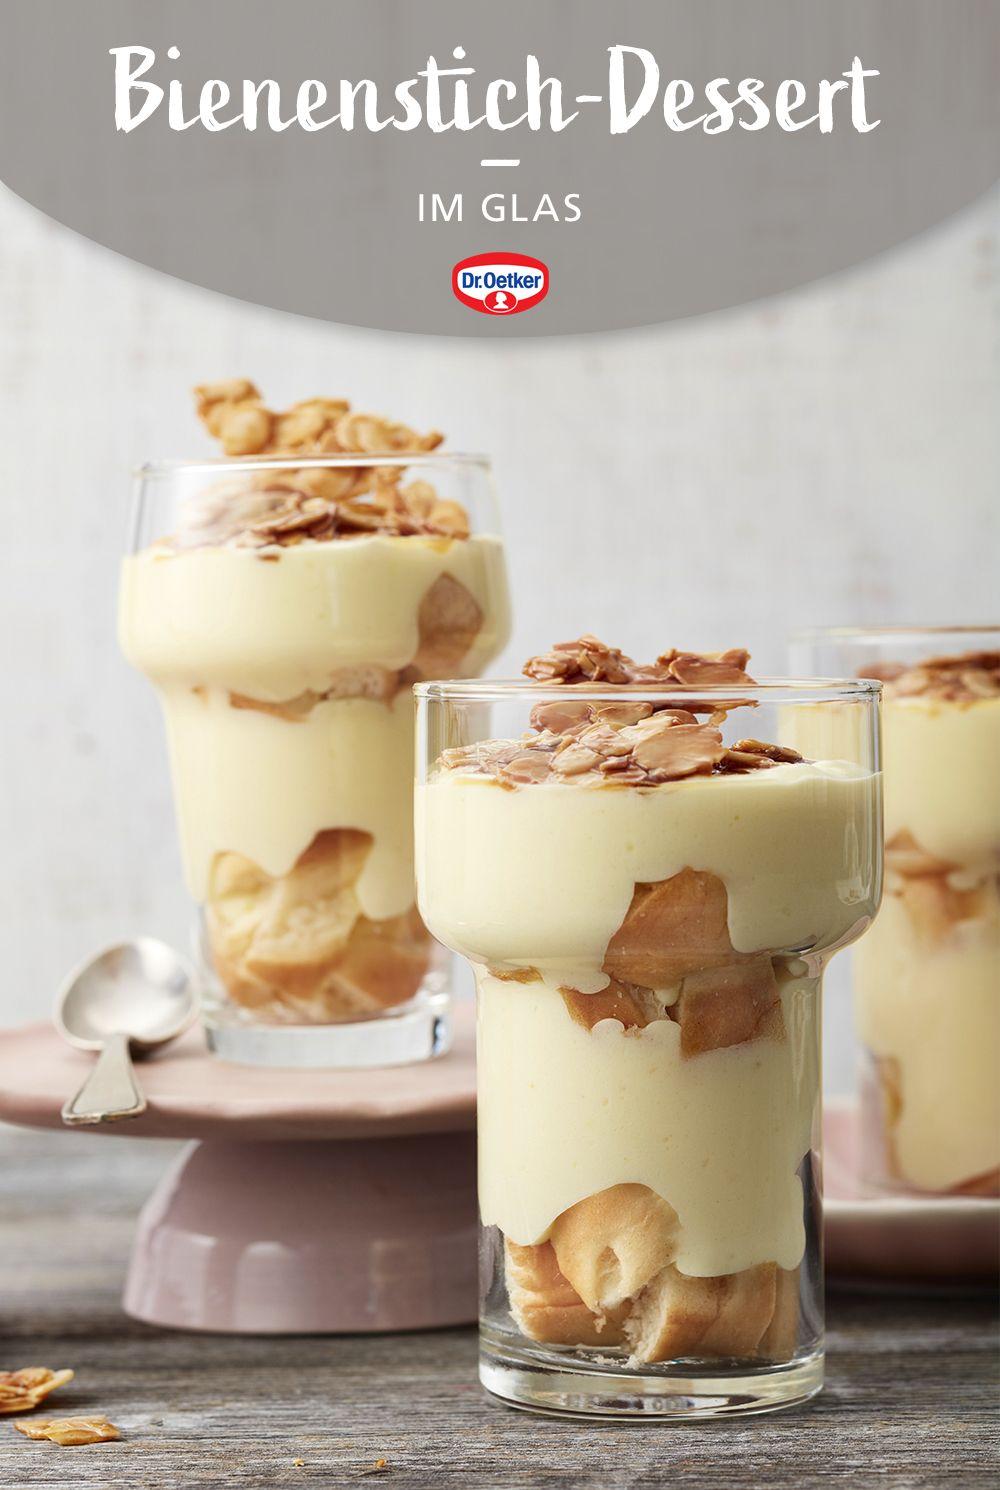 20+ Dessert im glas rezepte Trends